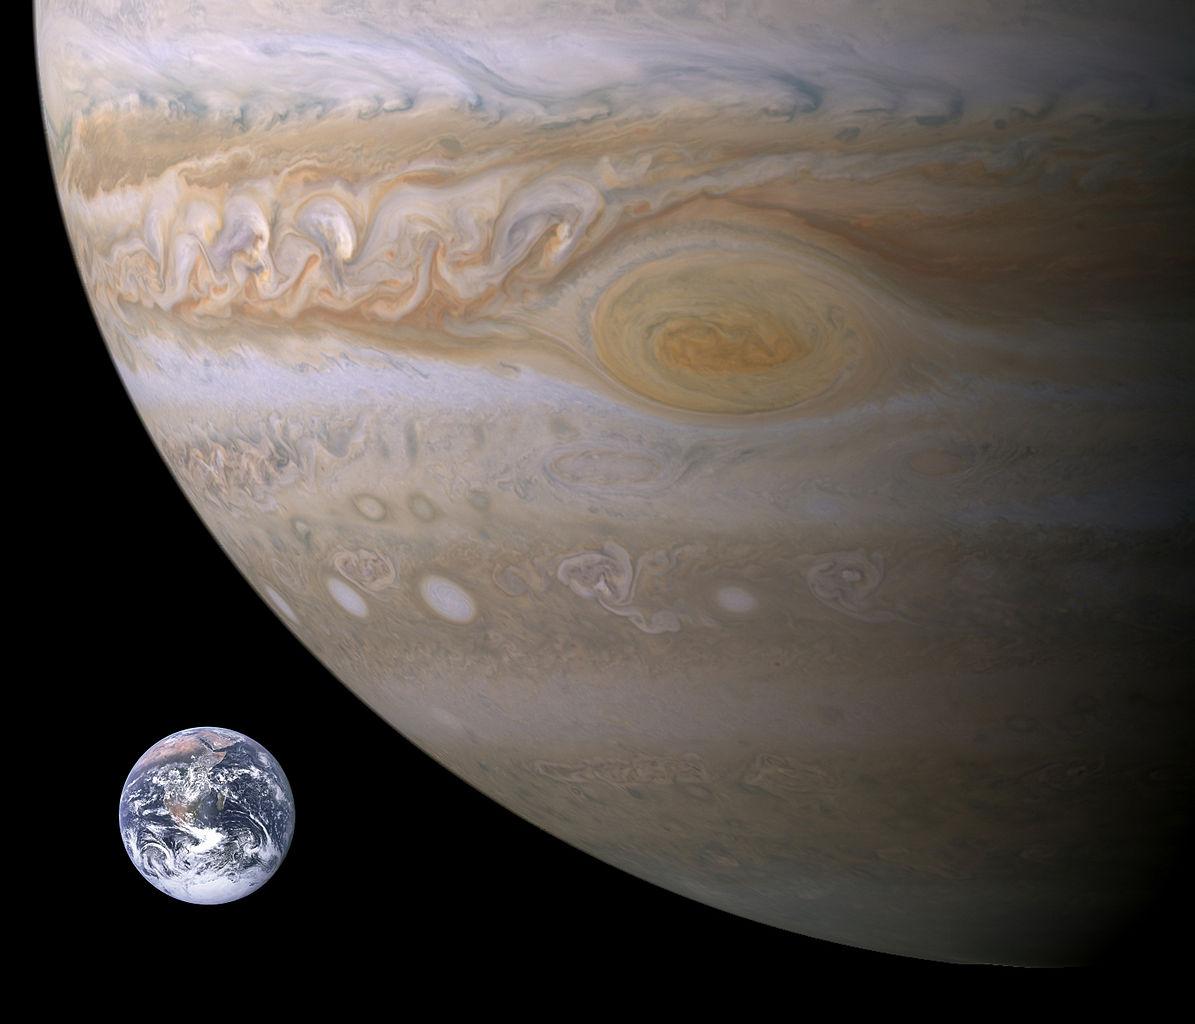 Jupiter-Earth comparison by NASA